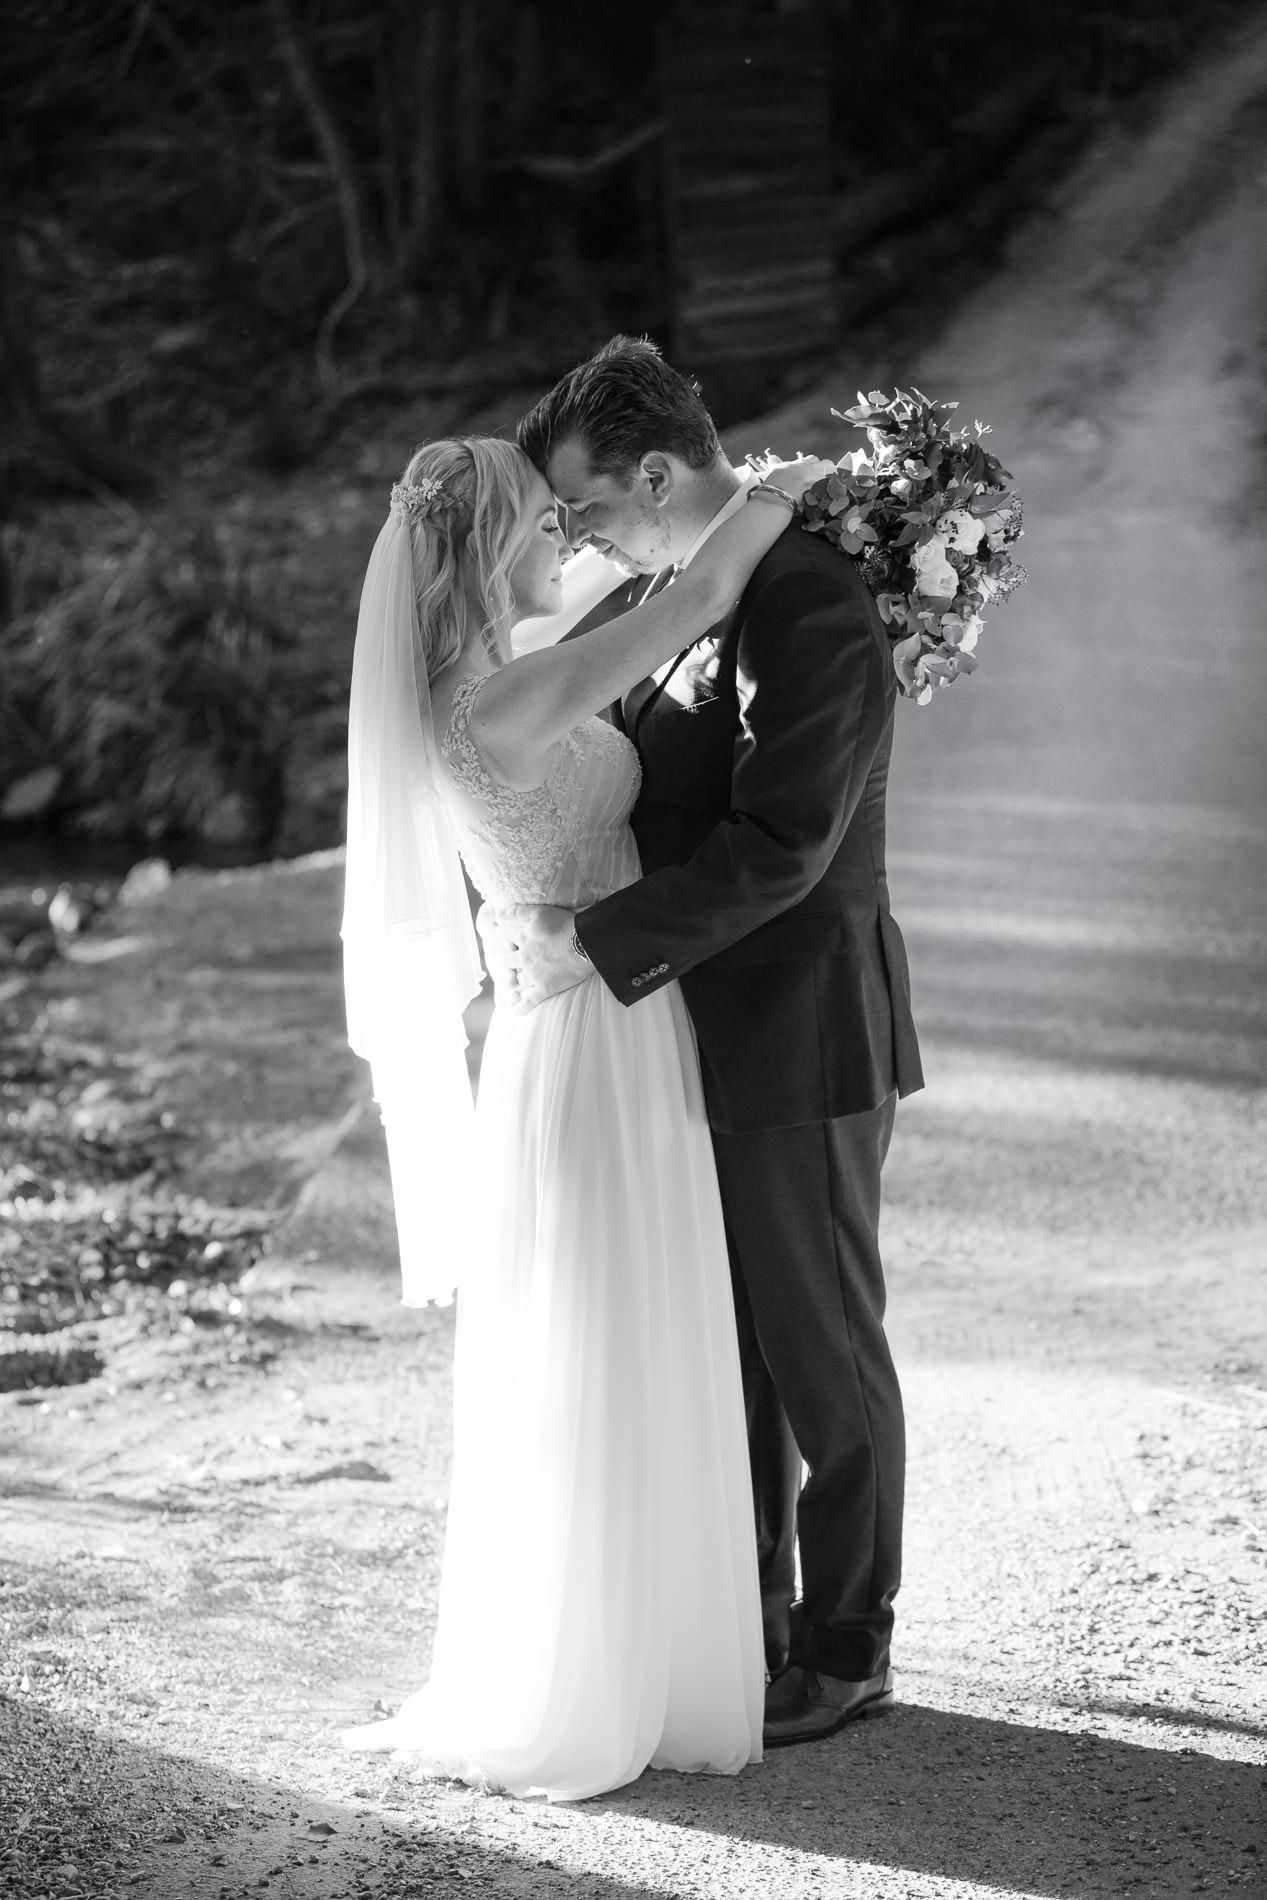 True North Photography_Boomerang Farm_Stacey and Isaac_Gold Coast Wedding_Barm Wedding_Hinterland Wedding-140.jpg